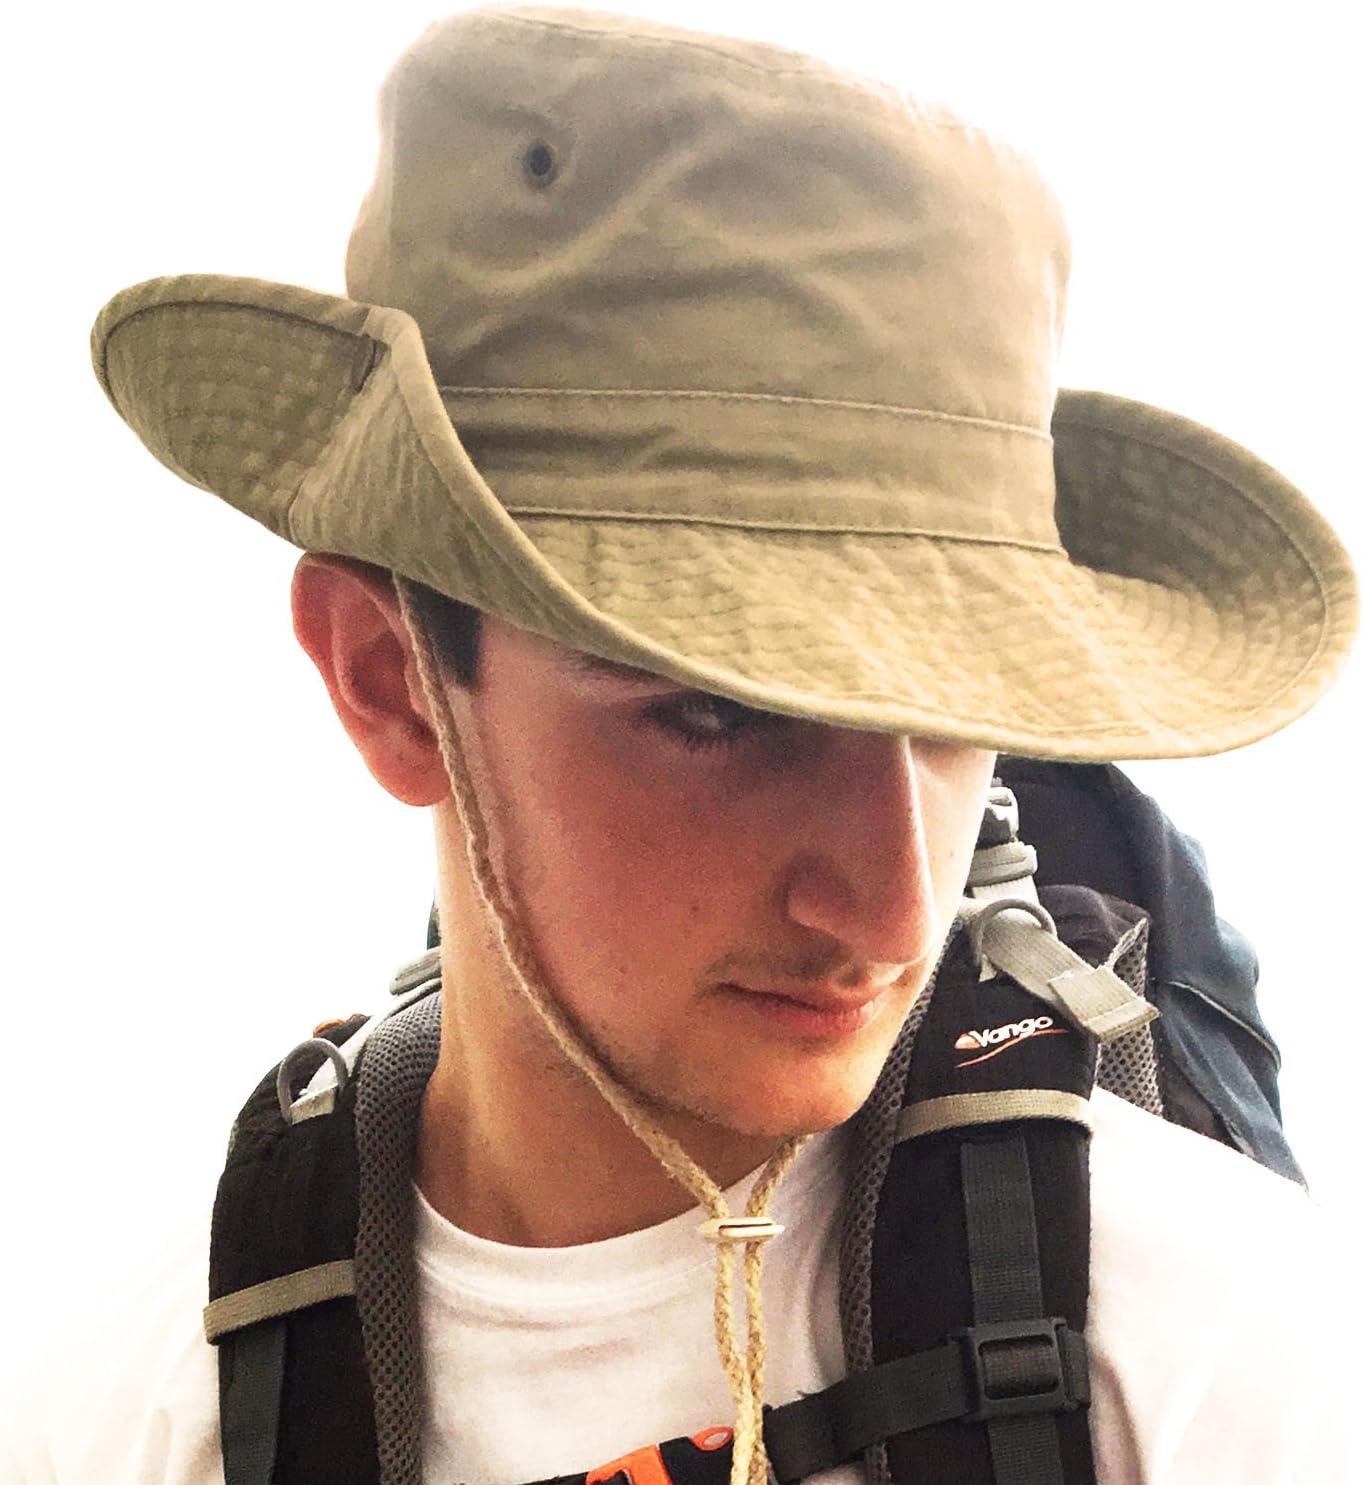 Tachuelas de presi/ón Laterales y Salidas de Aire Unisex Safari Outback Sombrero Estilo arbusto de algod/ón Estilo Australiano con Borde Ancho Correa para la Barbilla TOSKATOK/® UPF 50